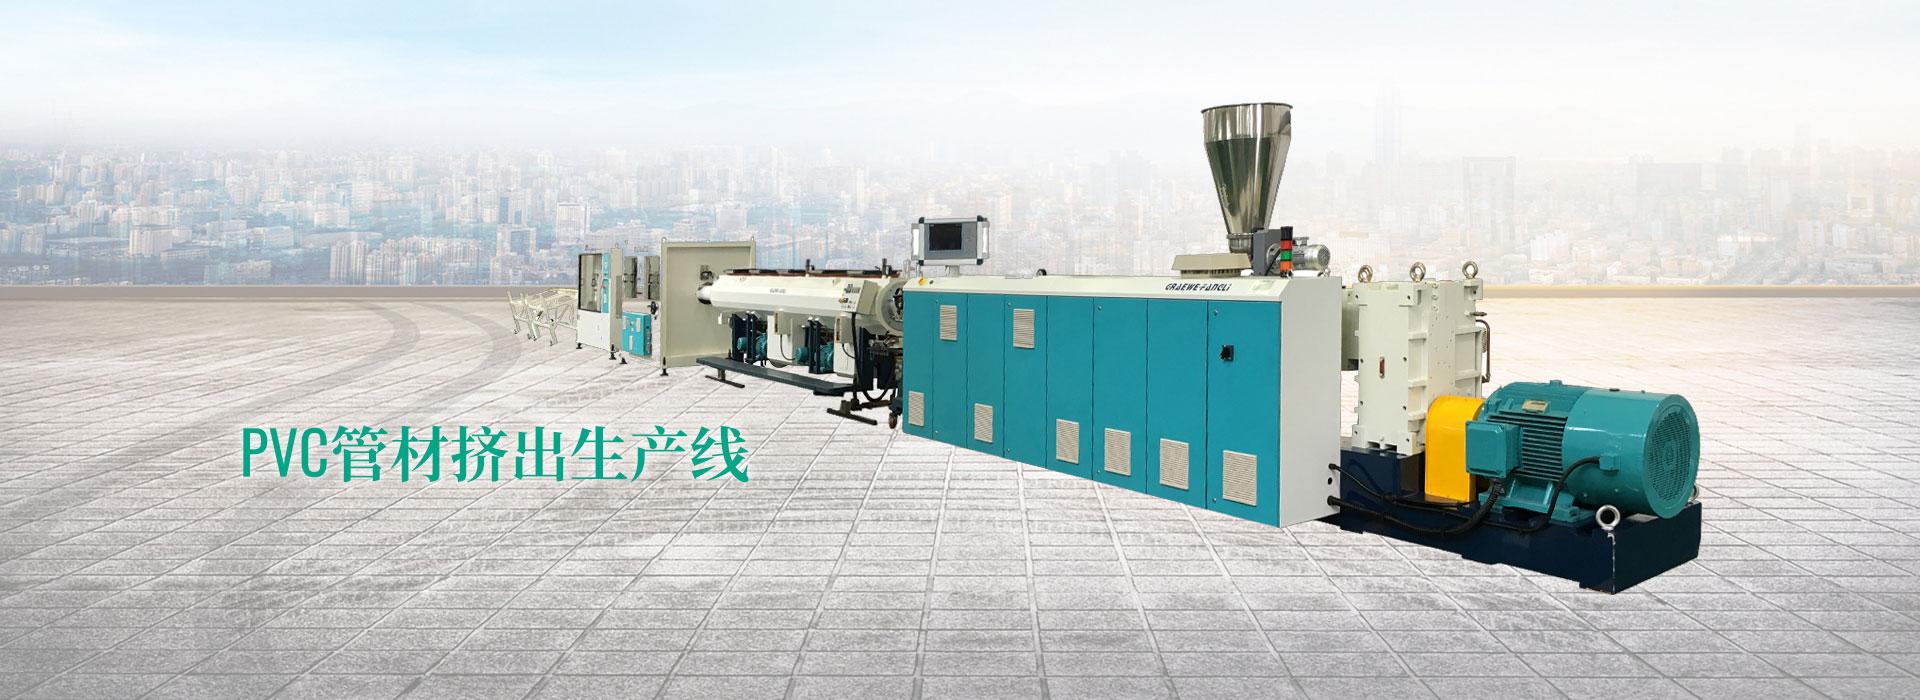 UPVC / PVC-UH管材生产线